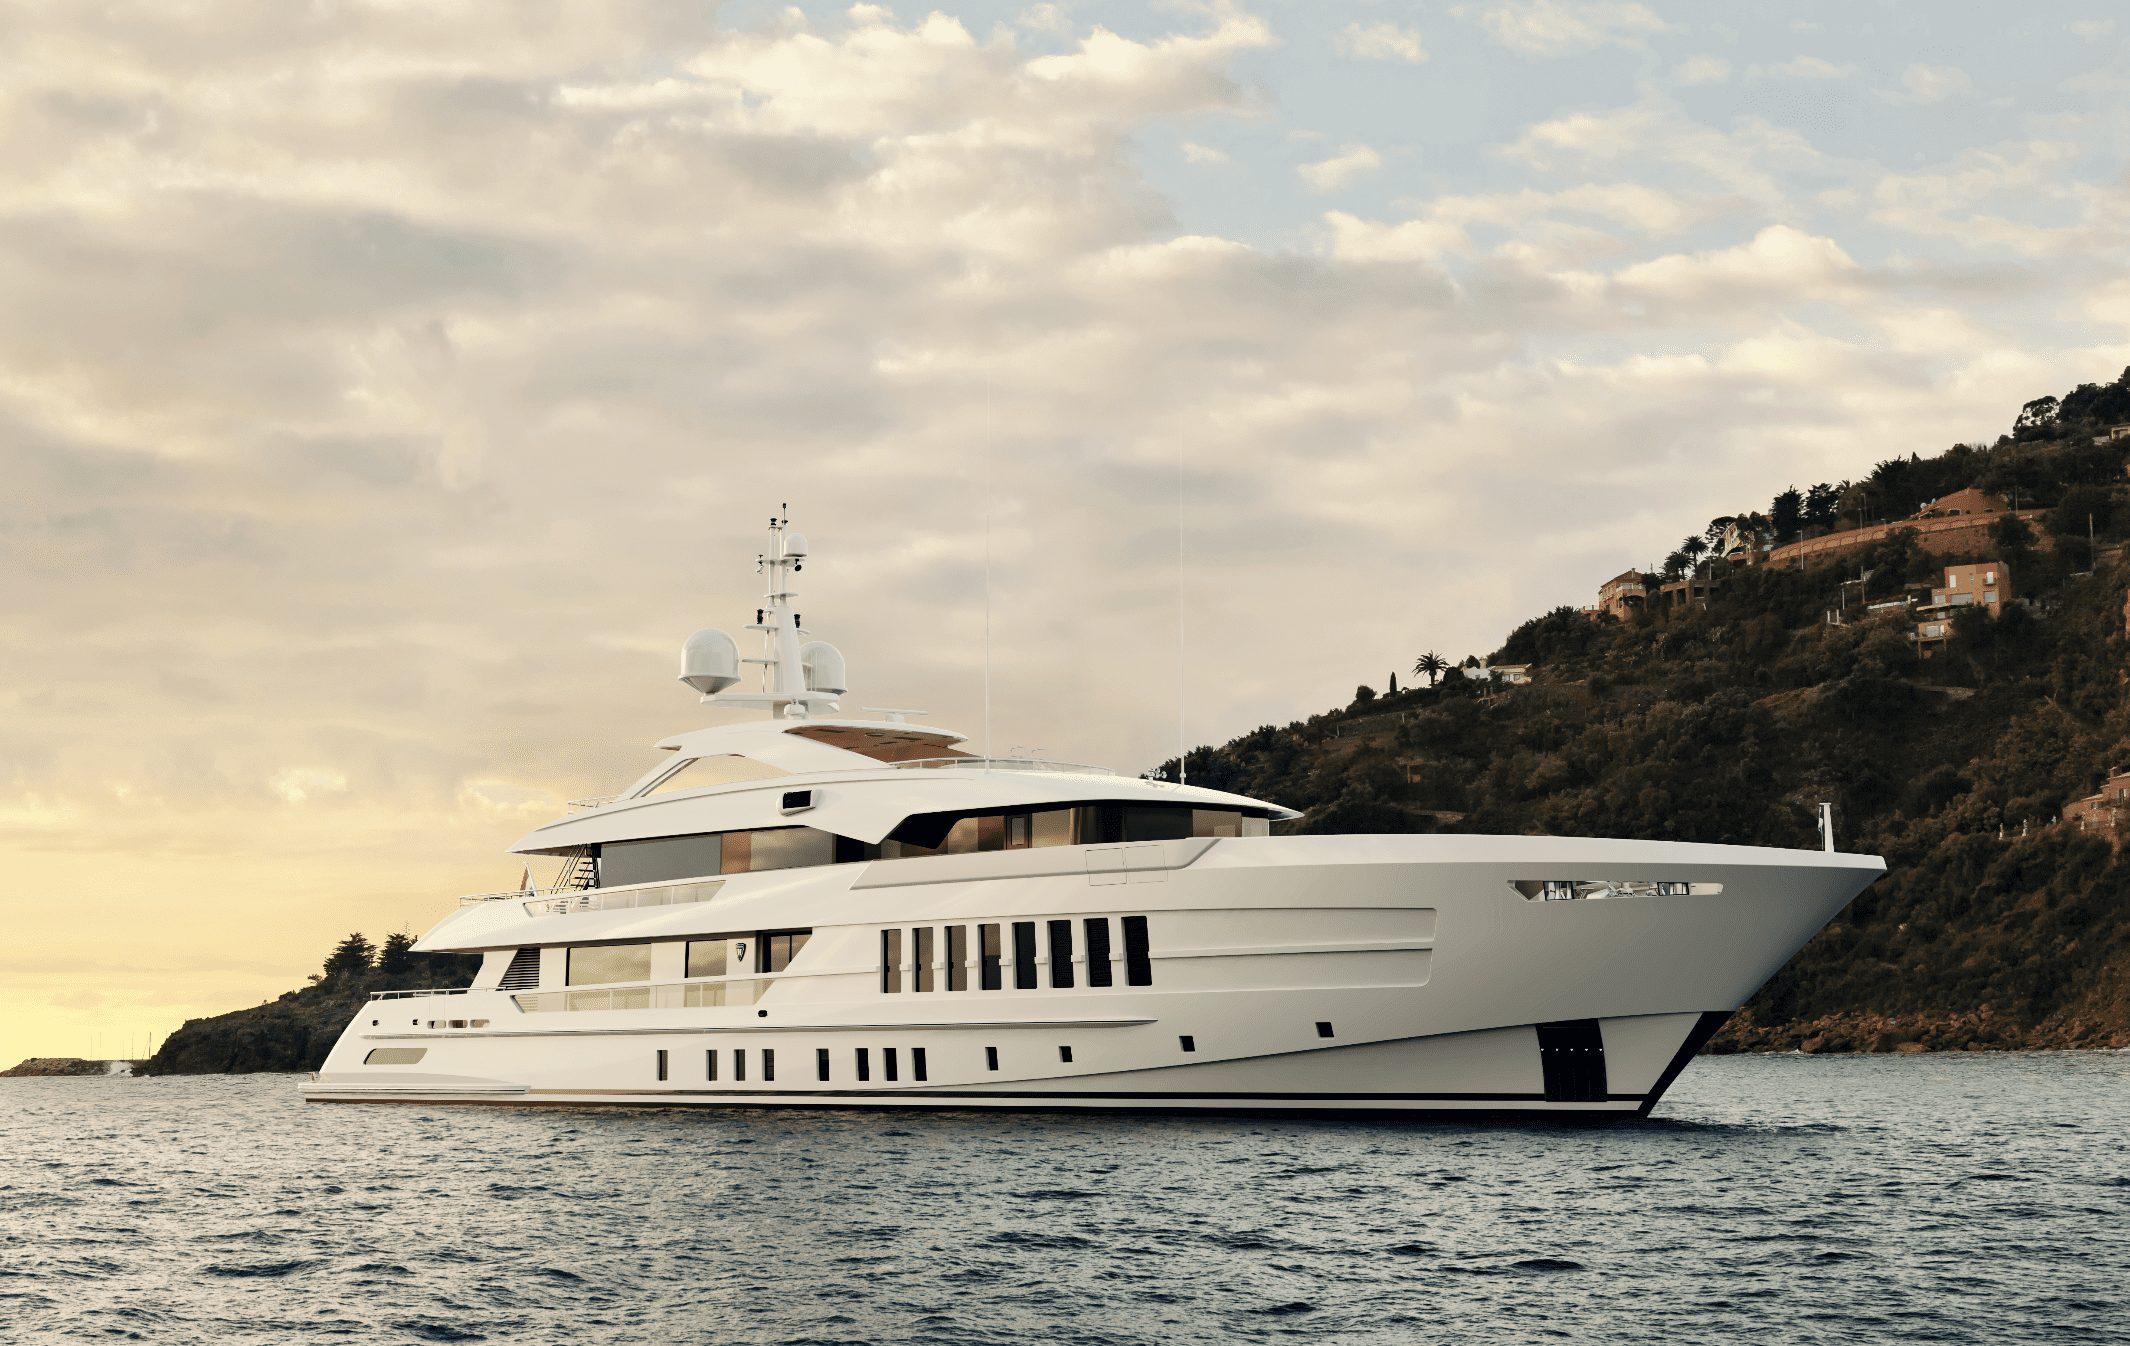 heesen superiate projeto gemini - boat shopping